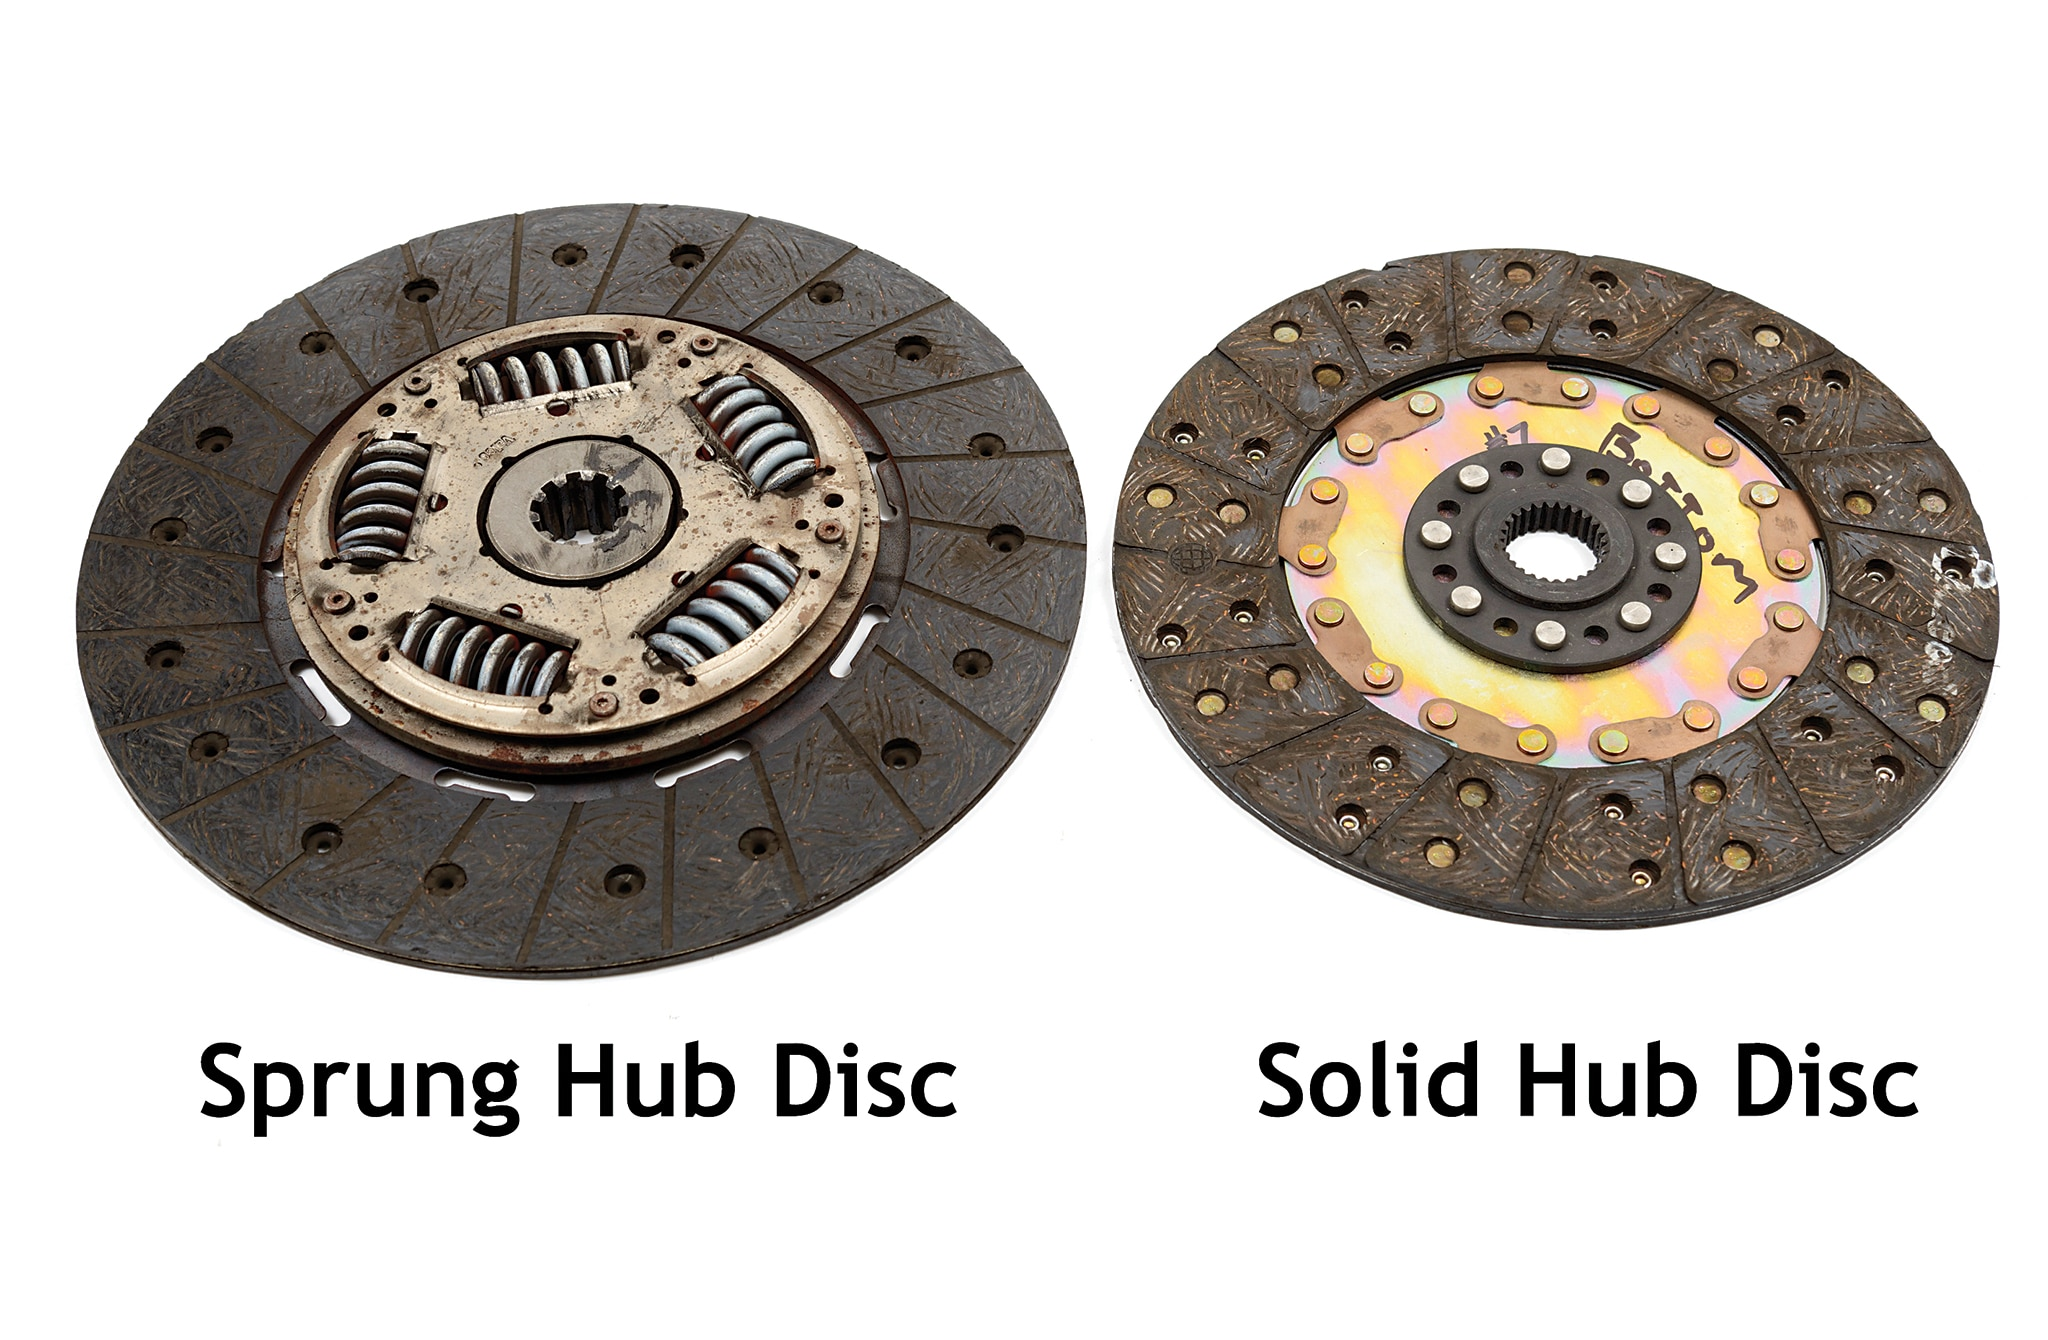 Sprung Hub Disc